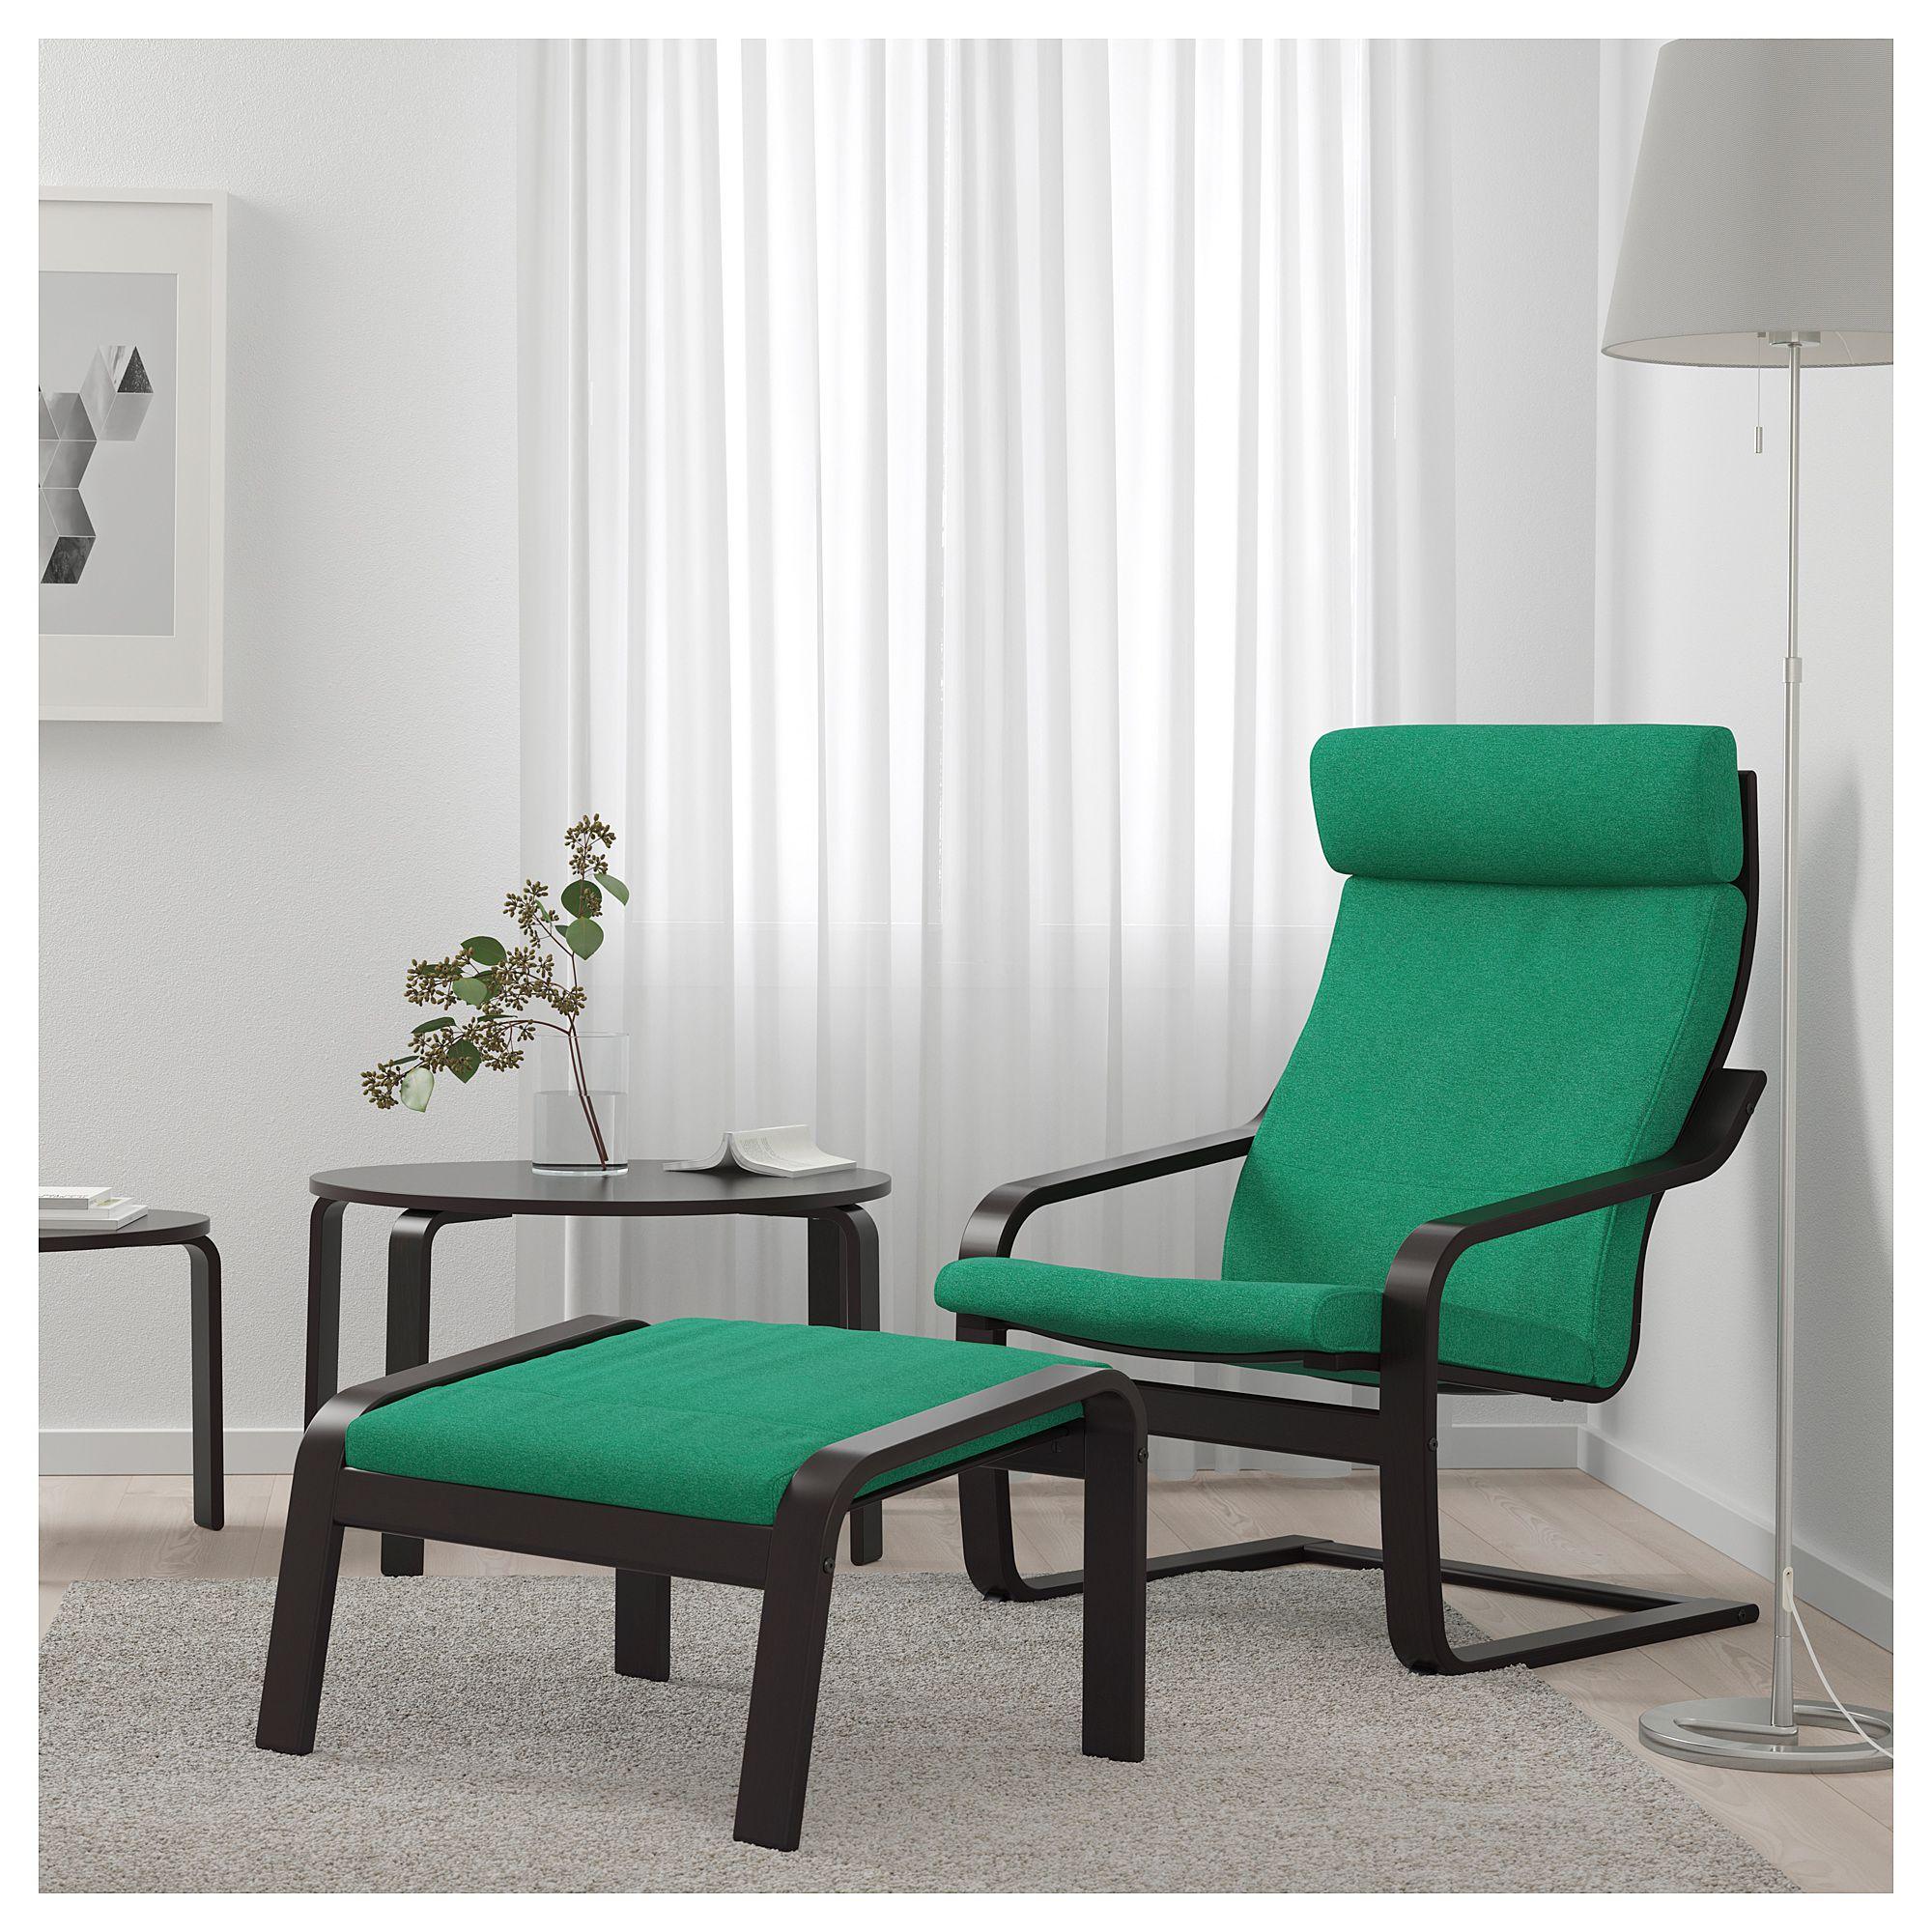 Ikea Poäng Repose Pieds Brun Noir Lysed Vert Vif In 2019